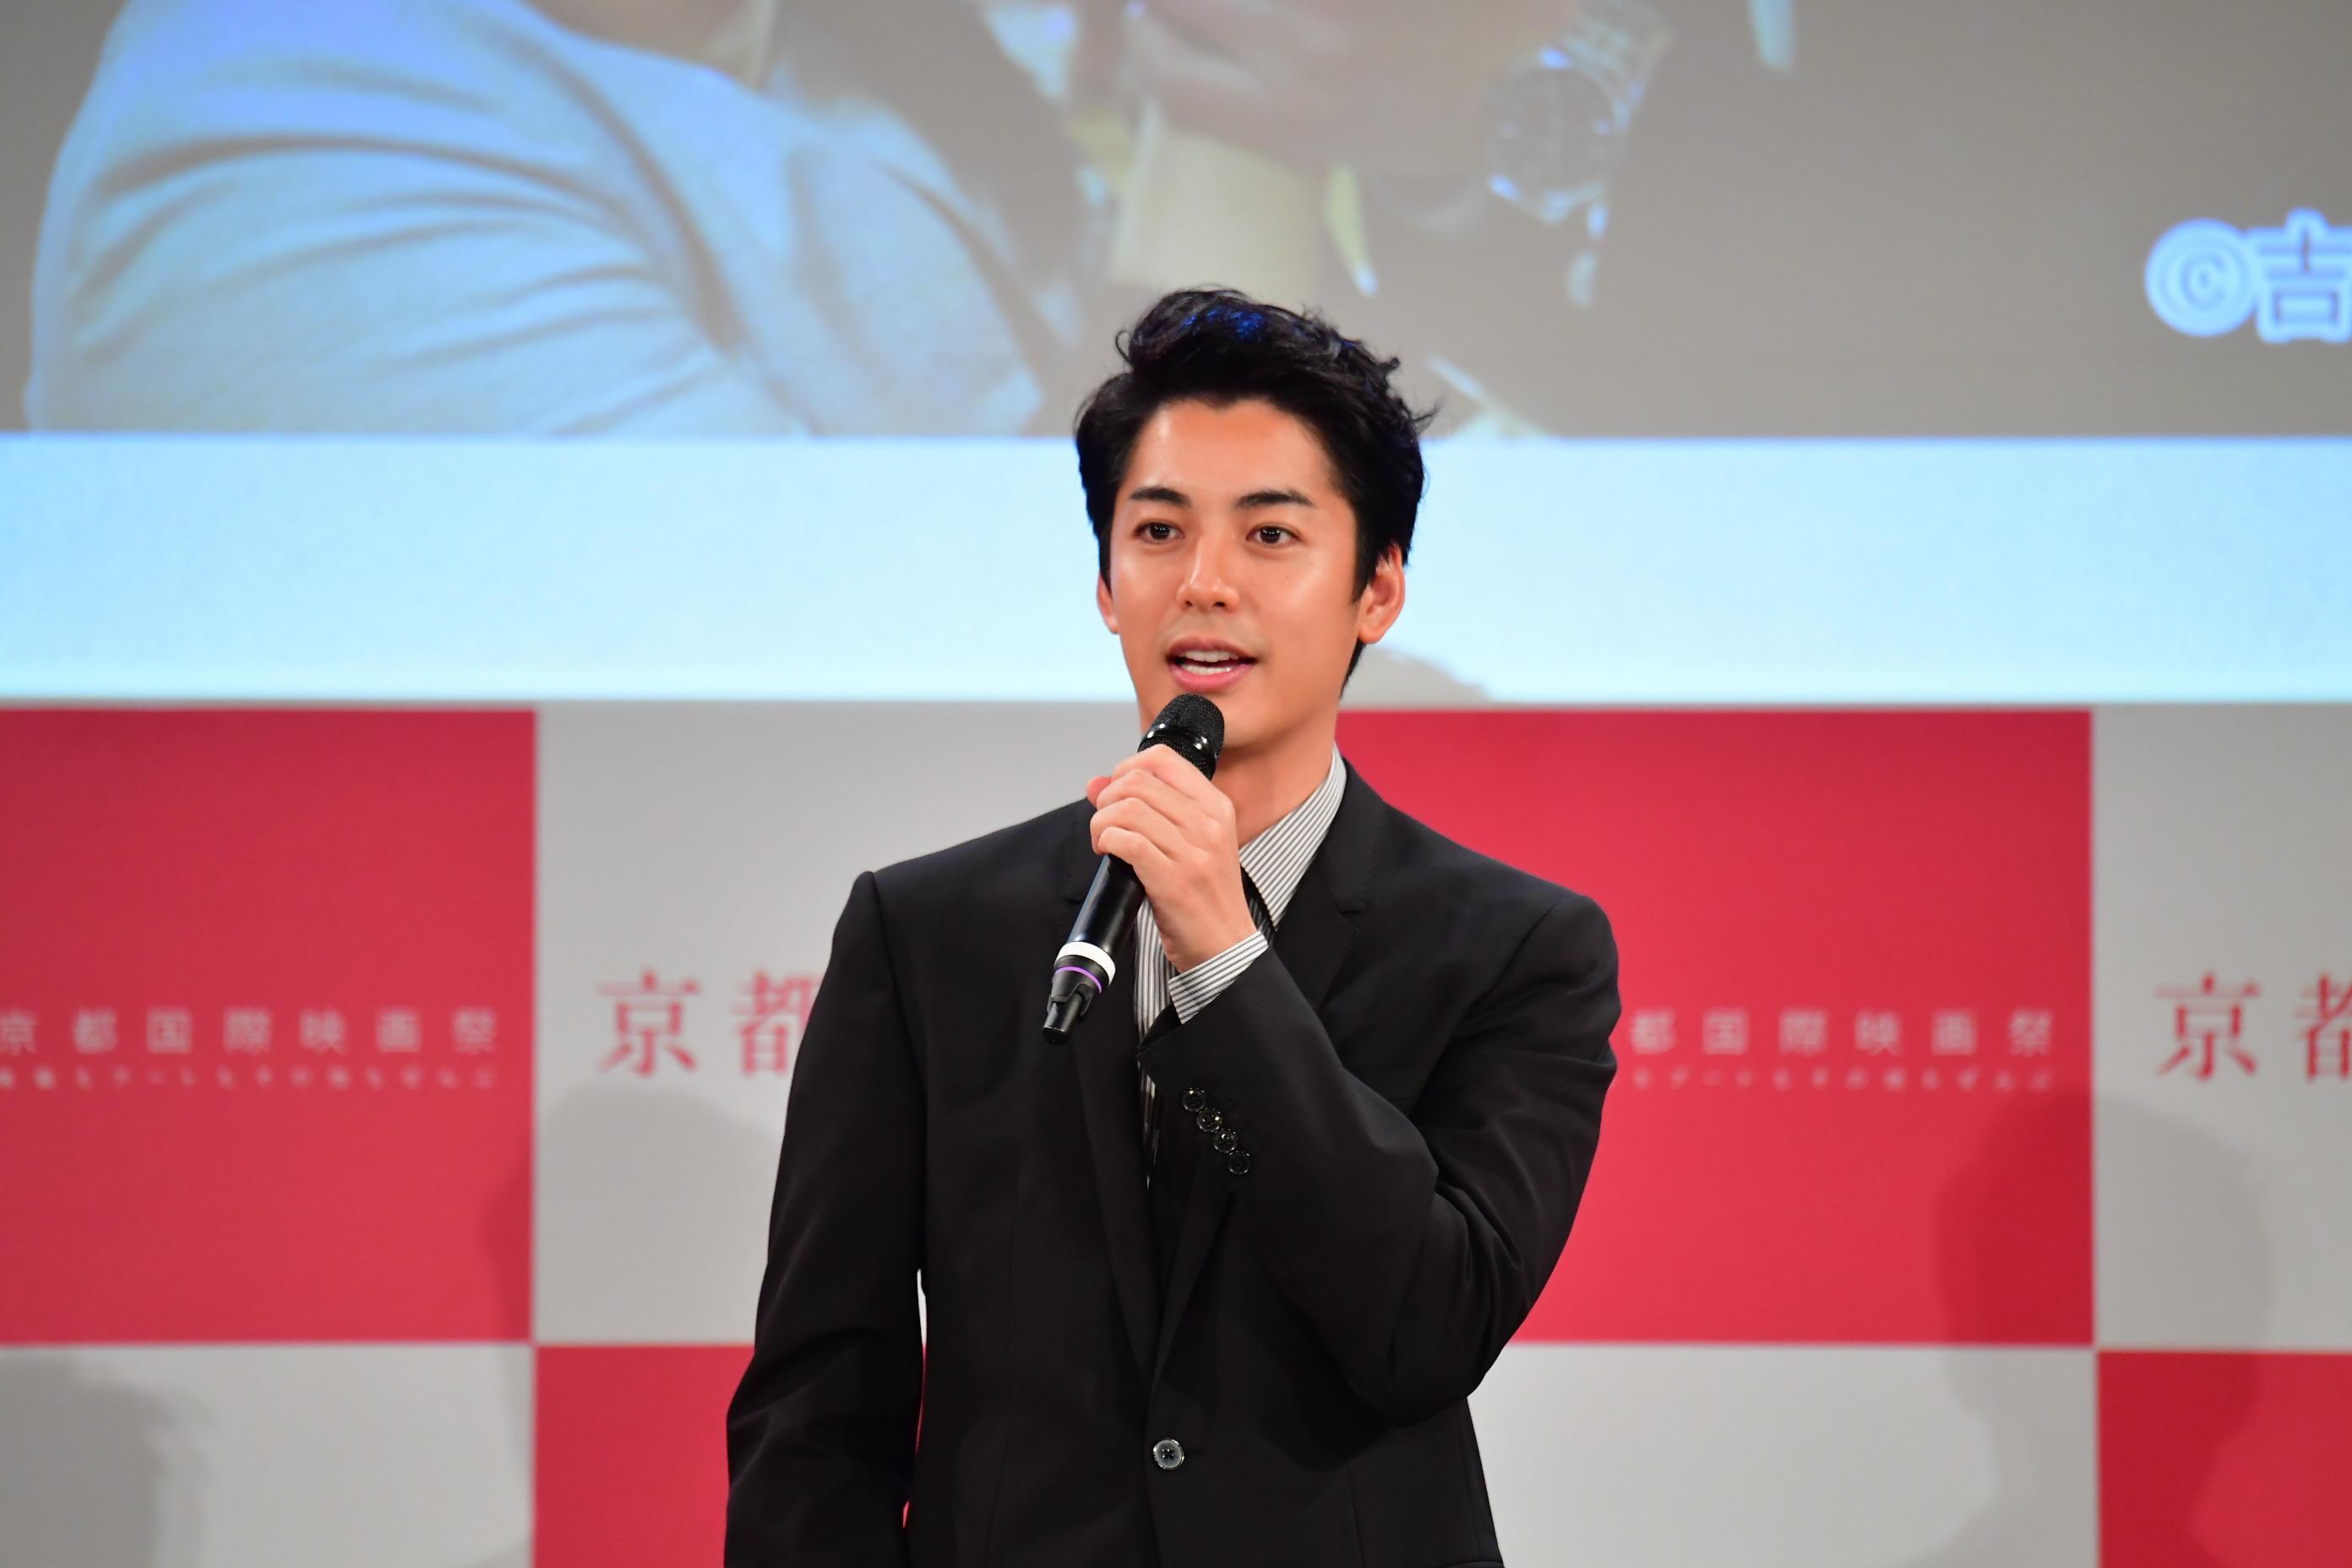 http://news.yoshimoto.co.jp/20180903233316-2270629c1d113dd4f1dd47230ce86569a1964b2c.jpg